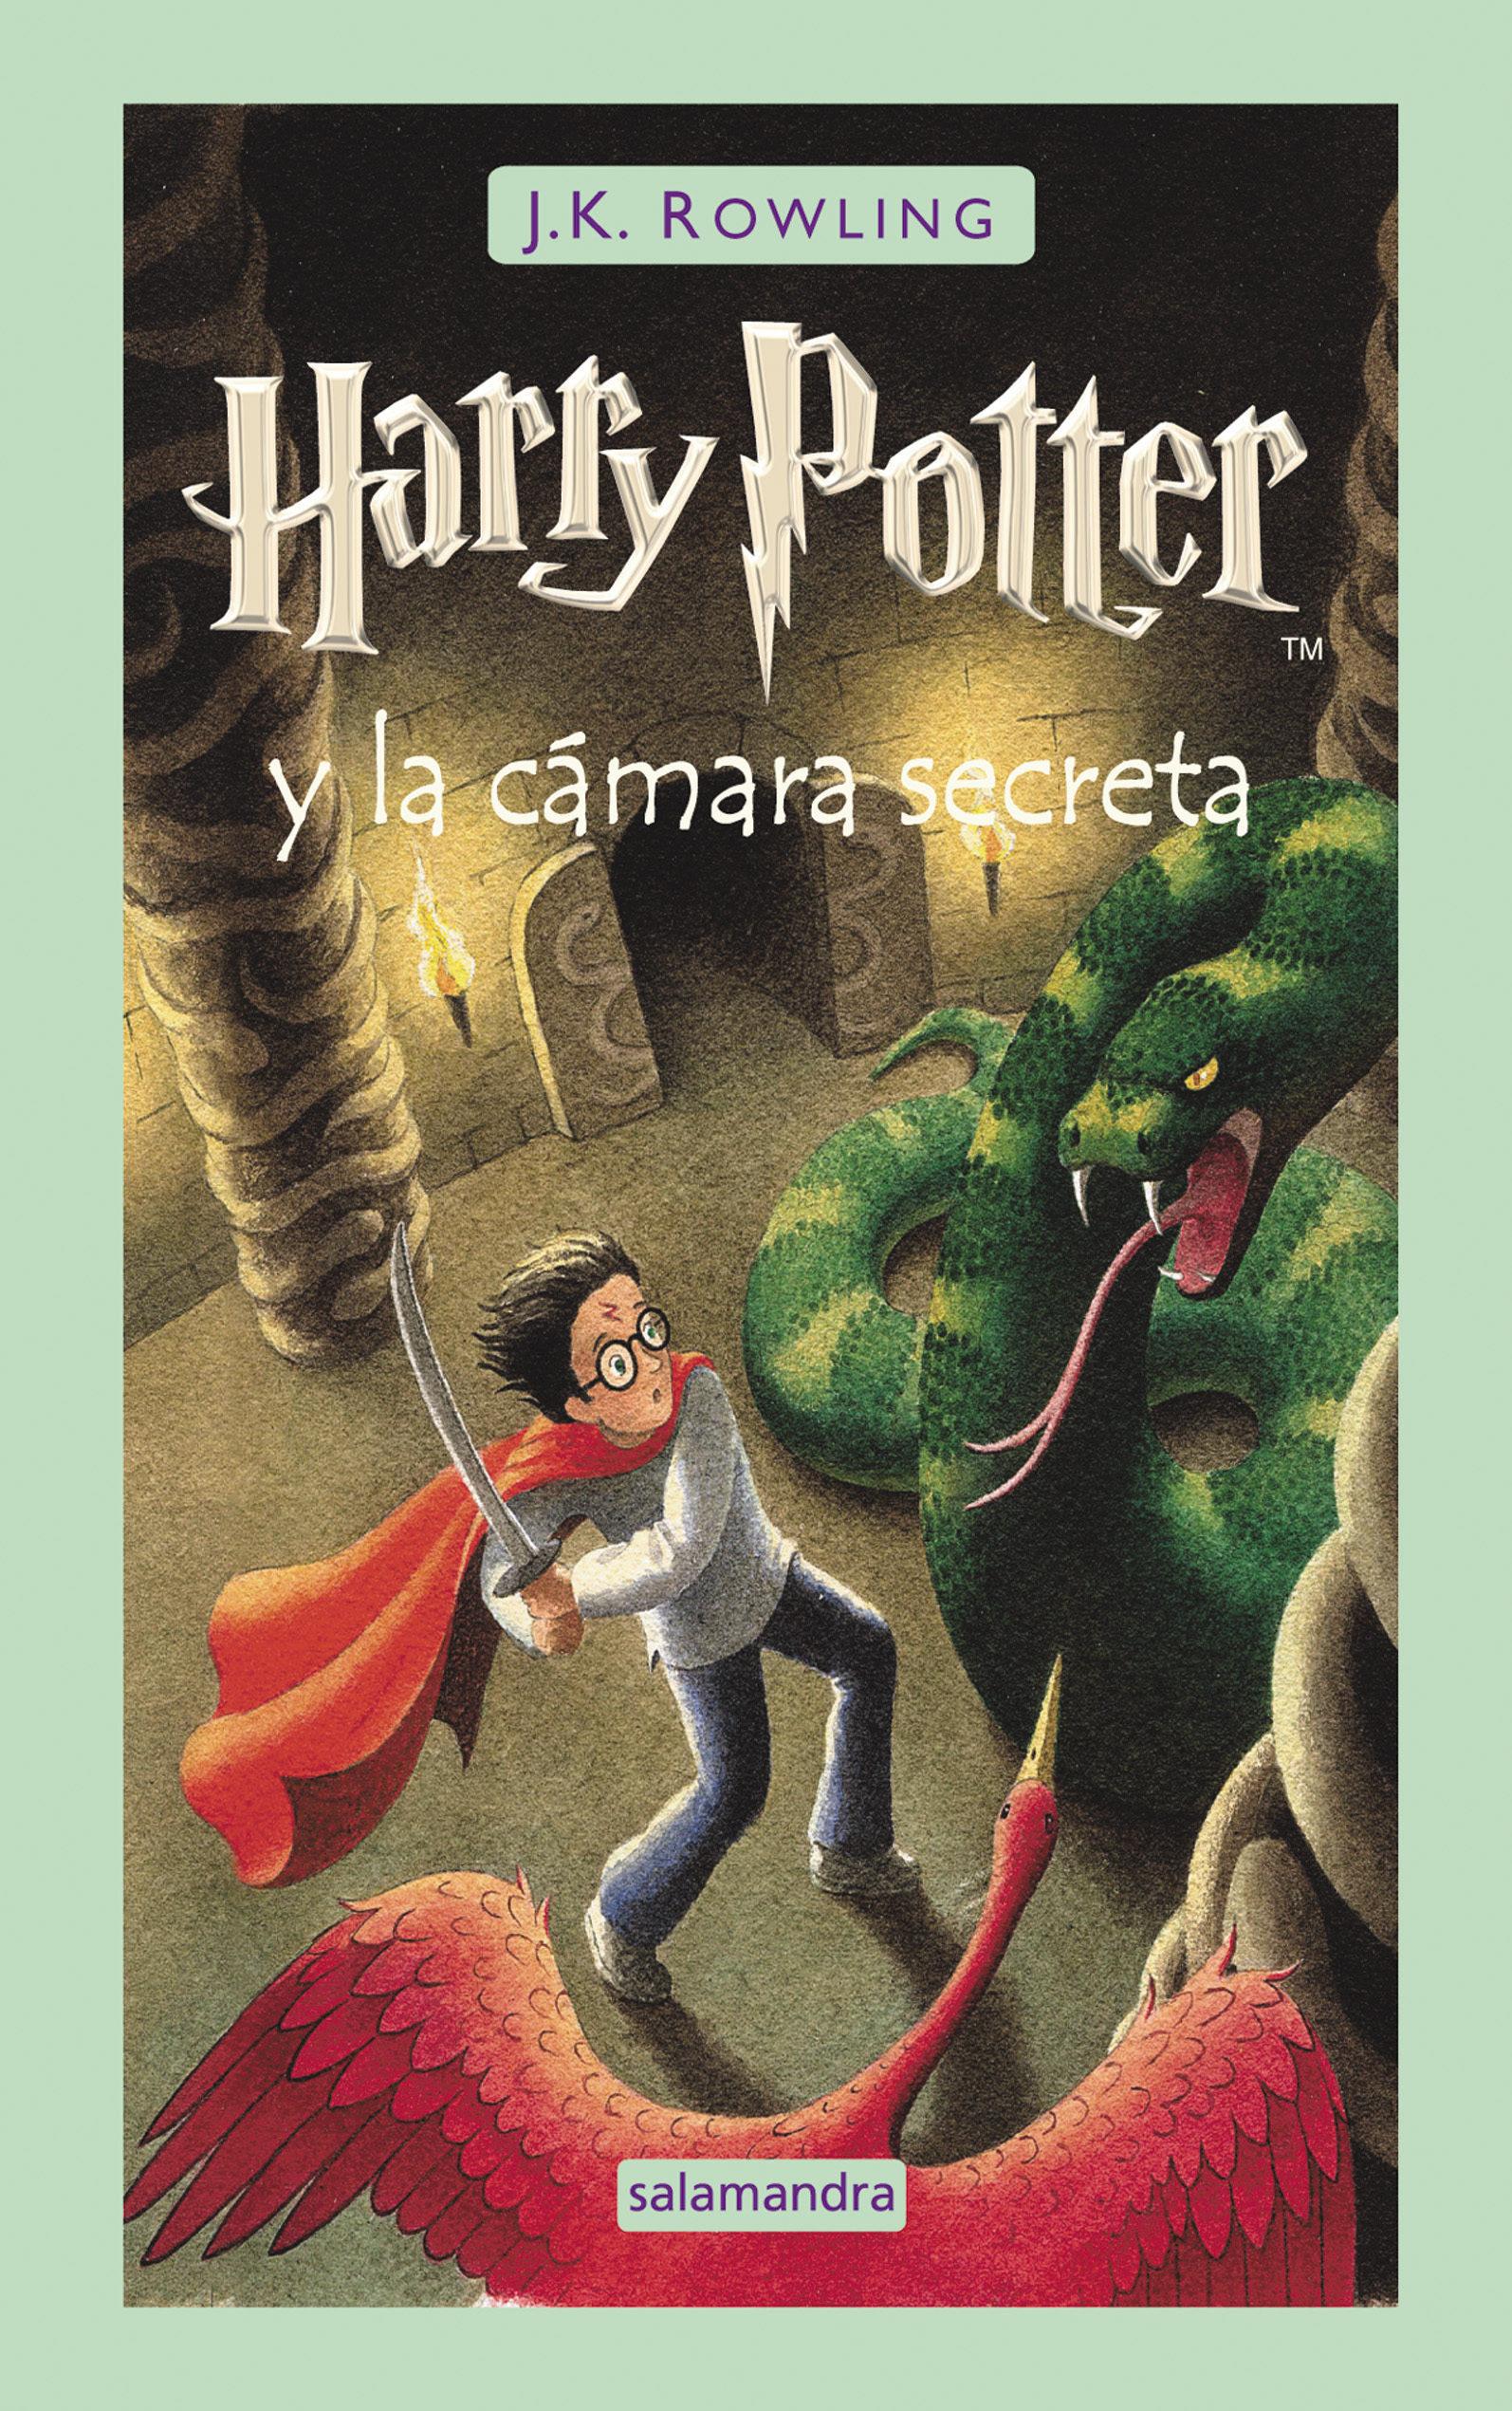 Harry Potter y la Cámara Secreta - J.K. Rowling - Salamandra